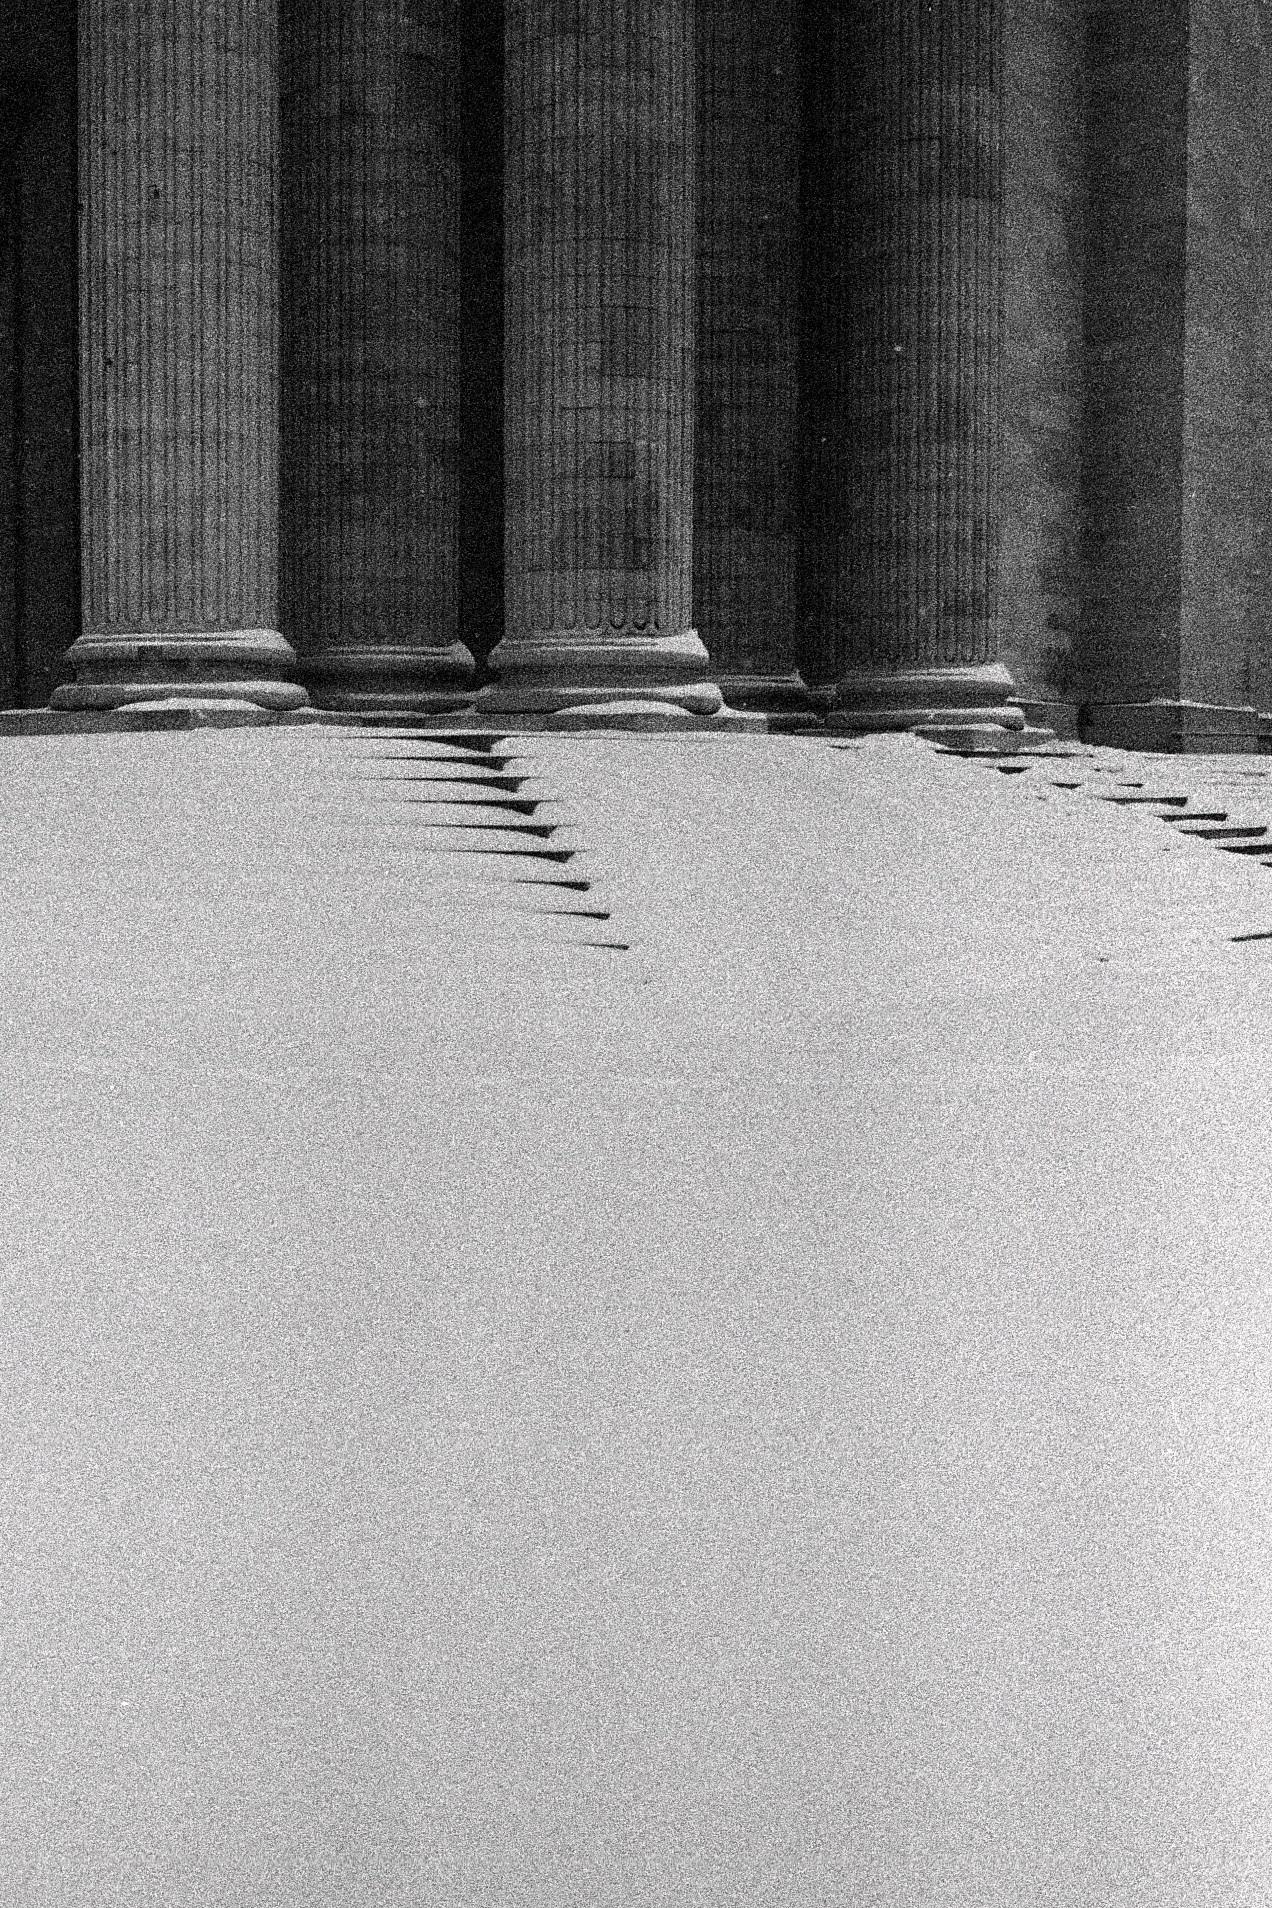 Snow in Pantheon